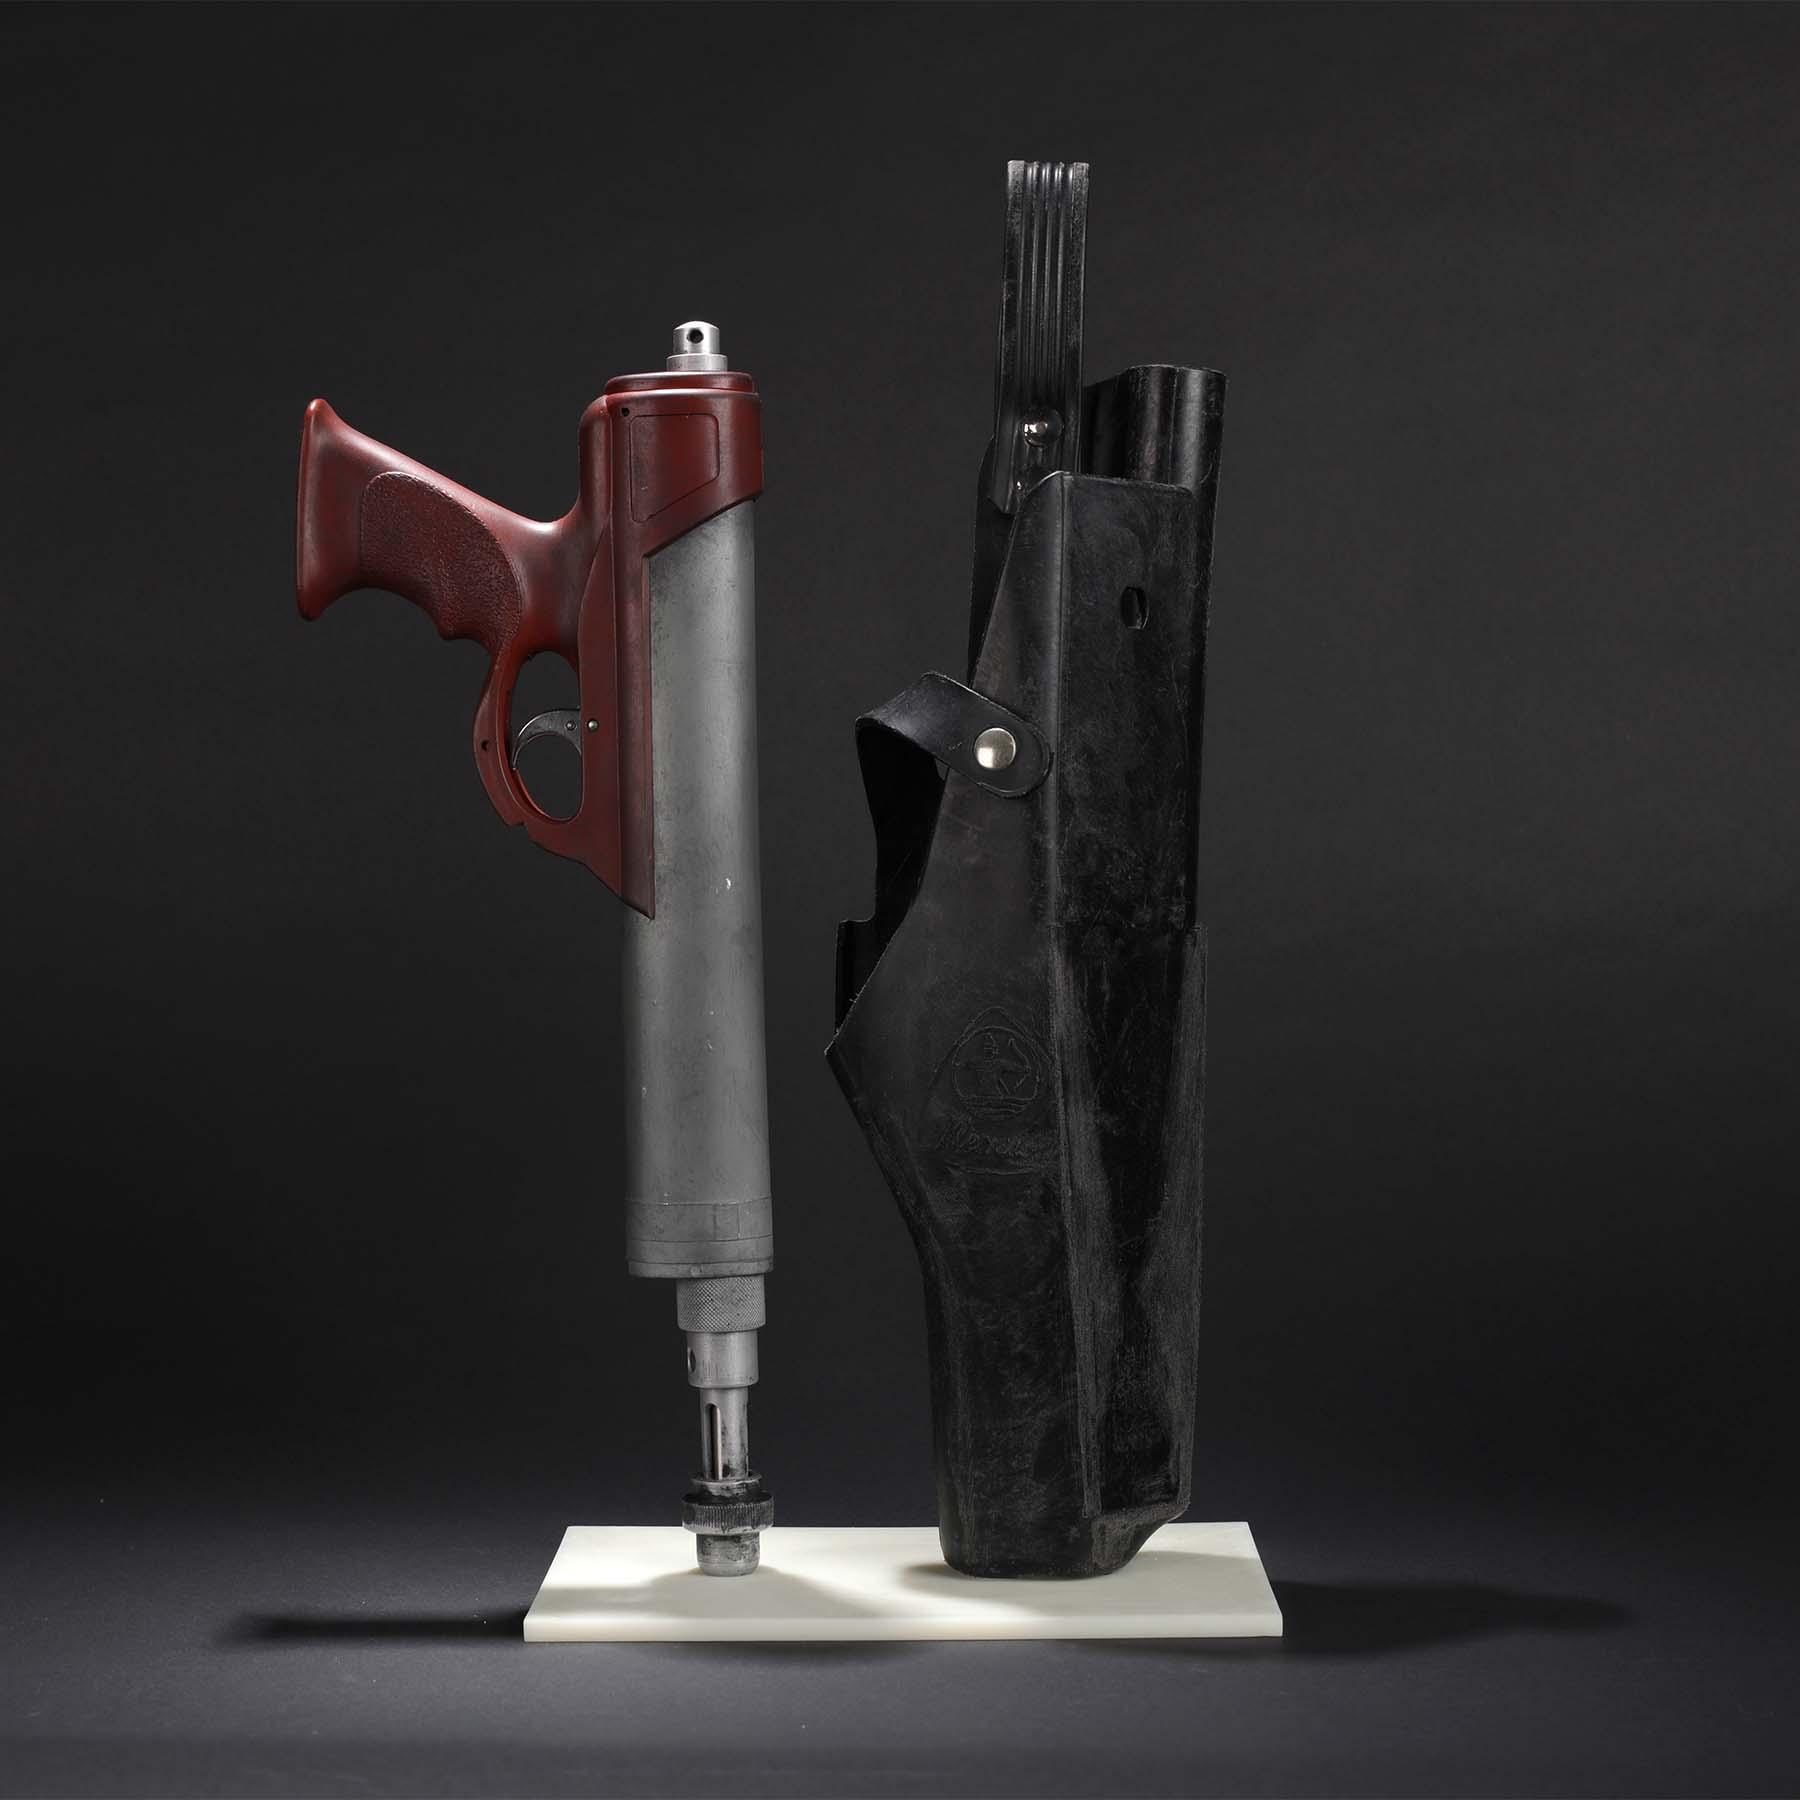 Boba-Fett-ESB-Pistol-and-Holster-Display.jpg